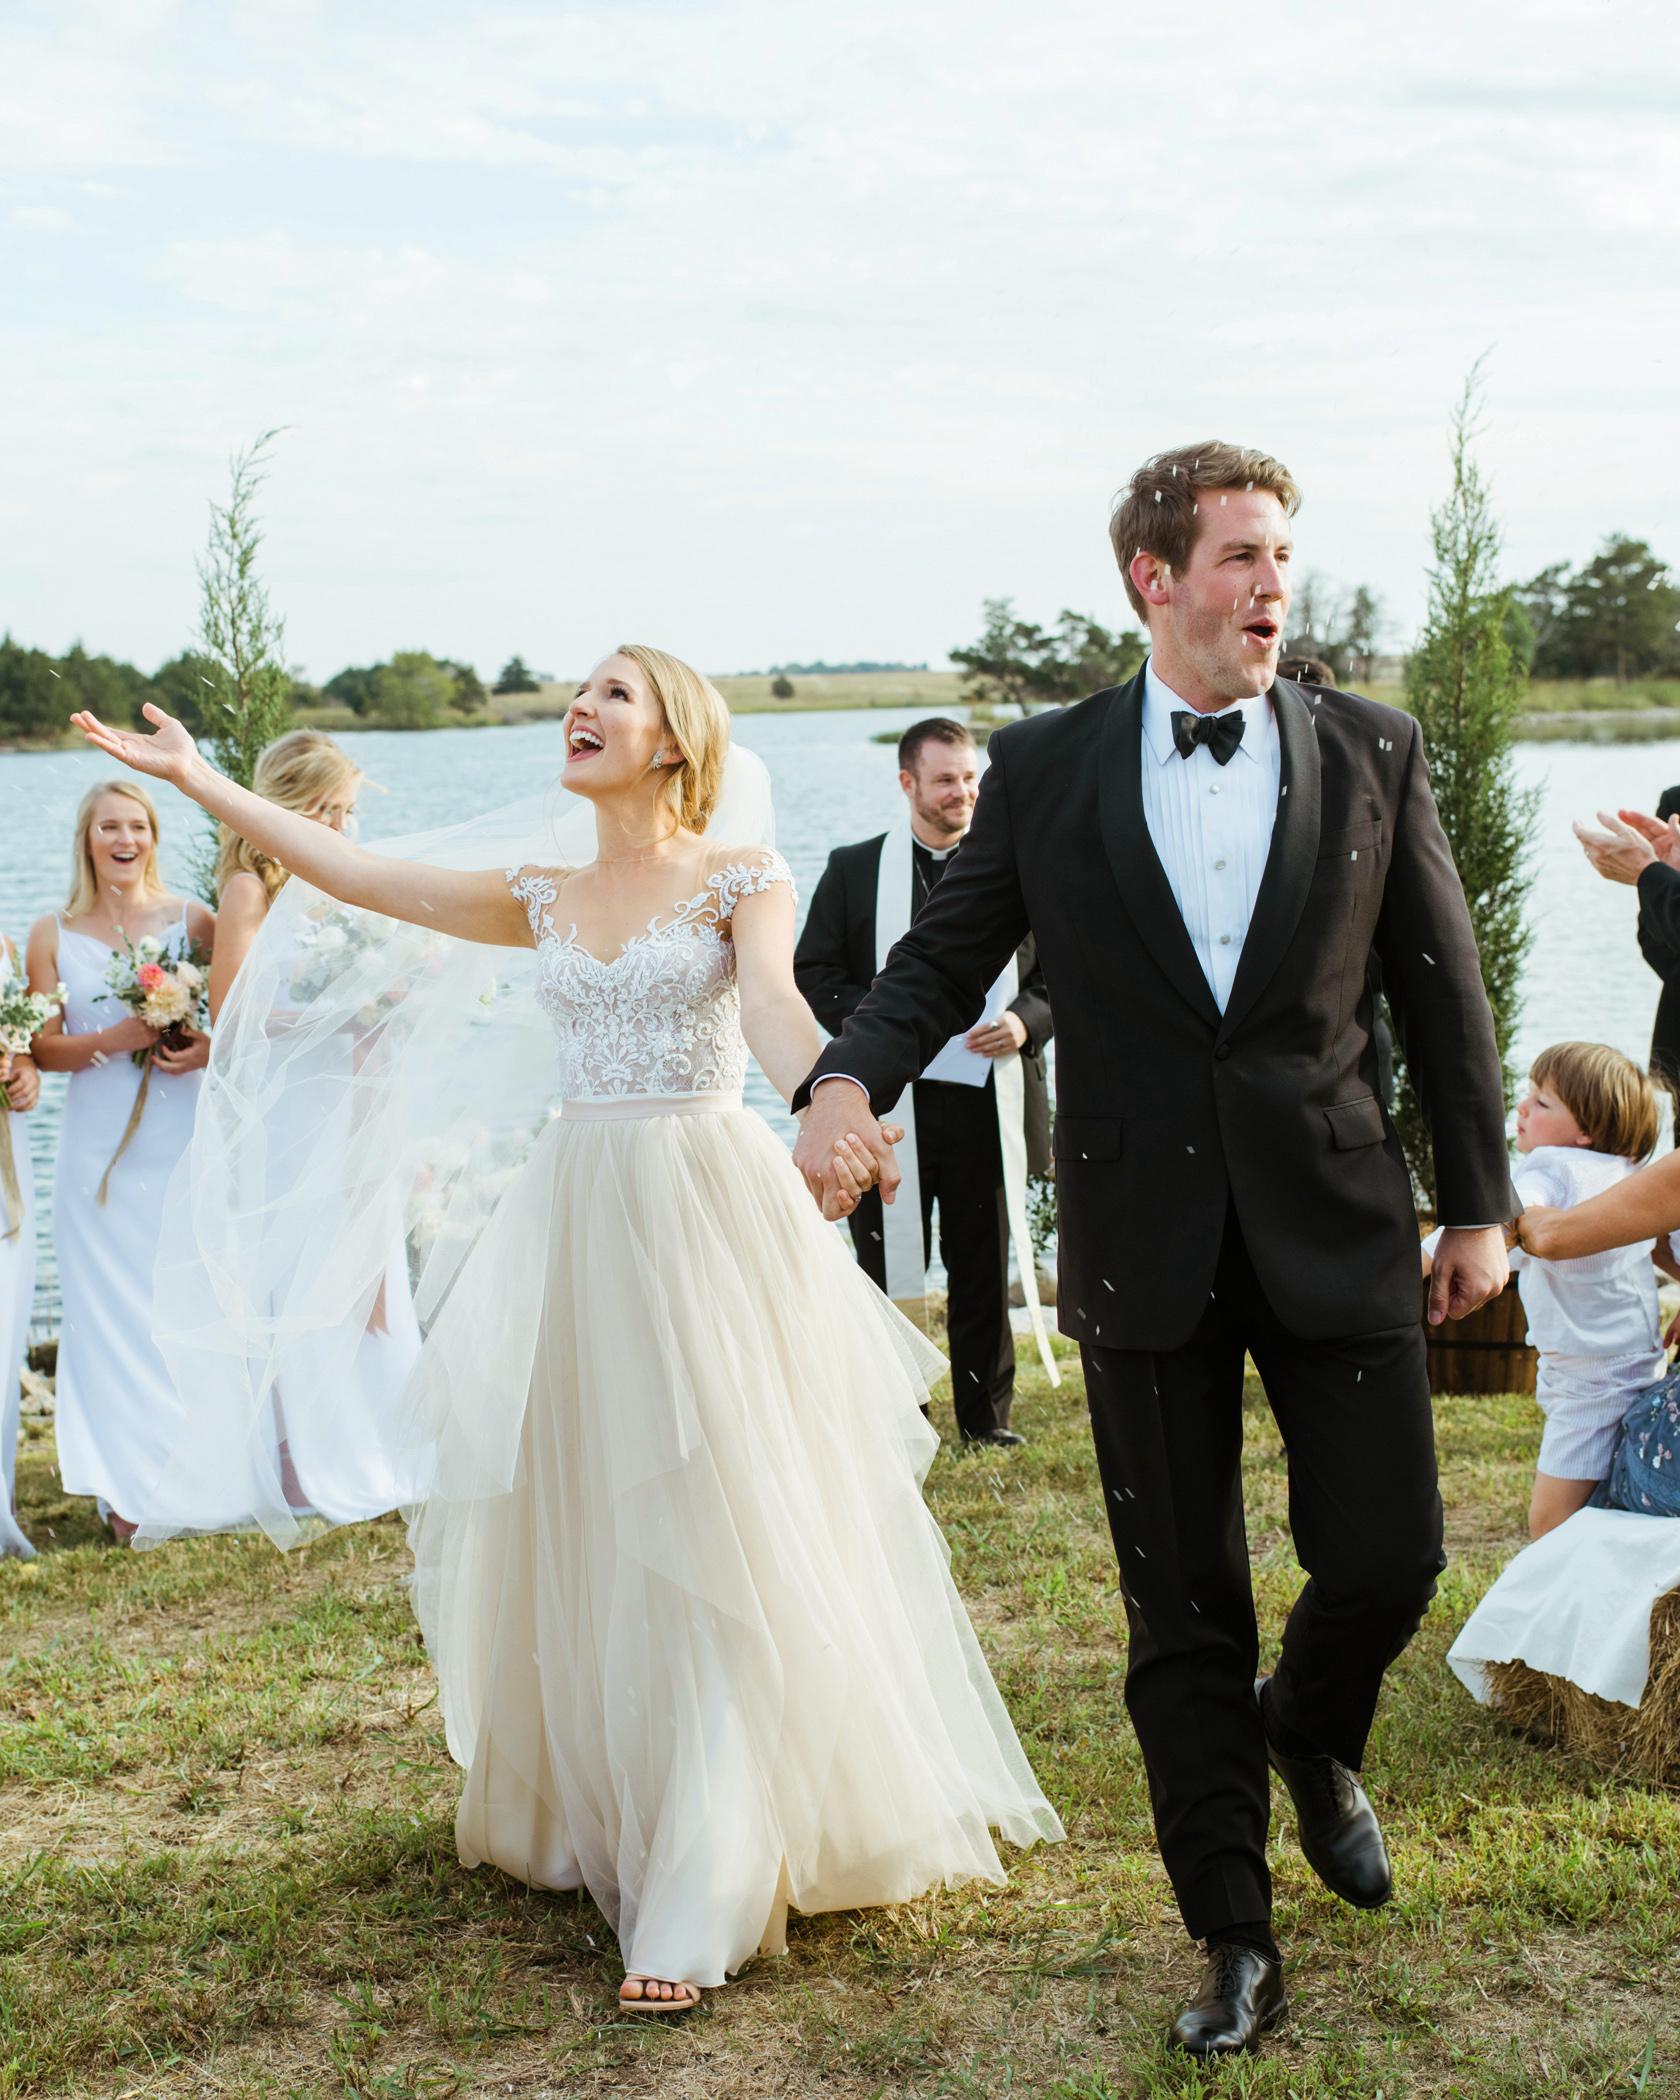 jessika william wedding rice toss